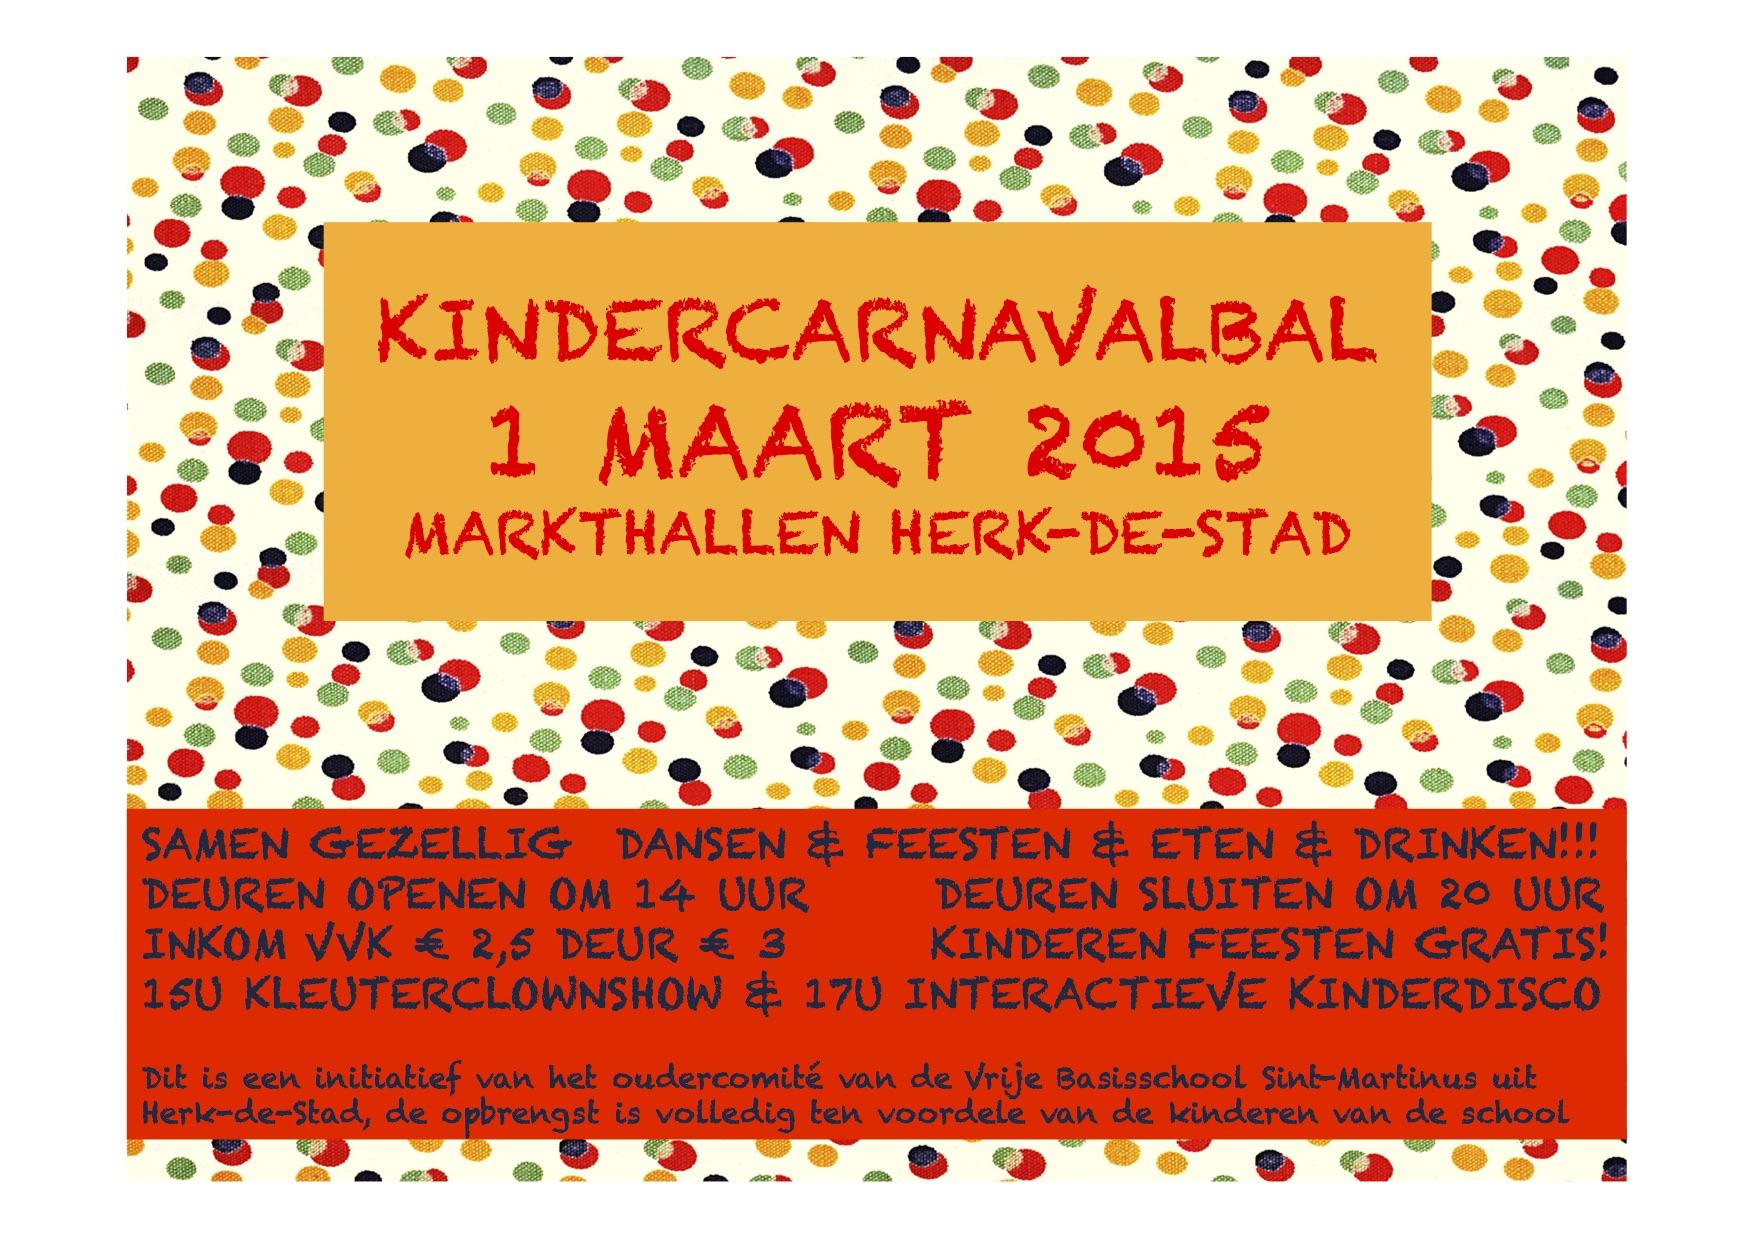 AFFICHE KINDERCARNAVALBAL 1 MAART 2015 FINAL kopie